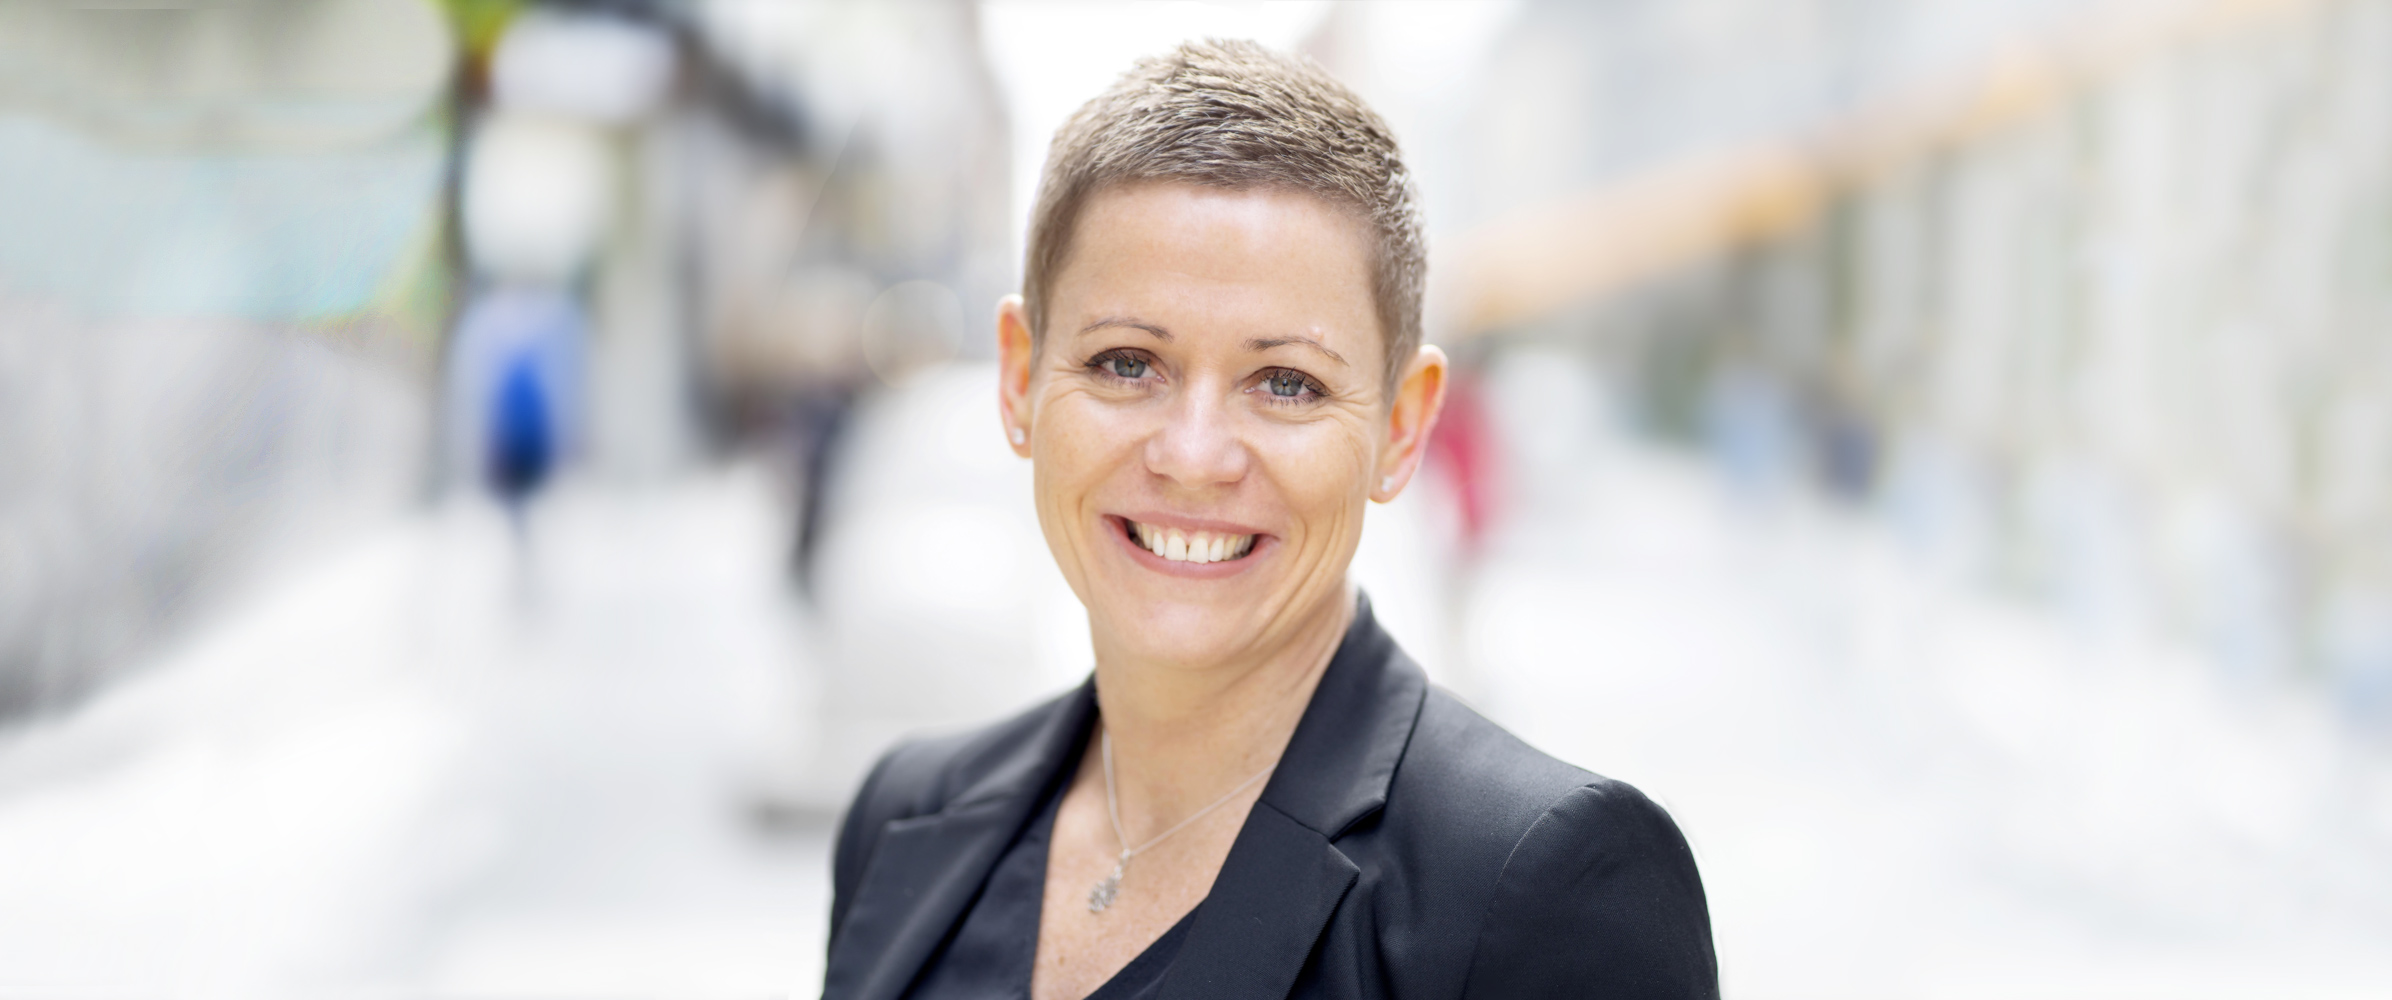 silje_lea_kommunikation_ledarskap_forandring-2020